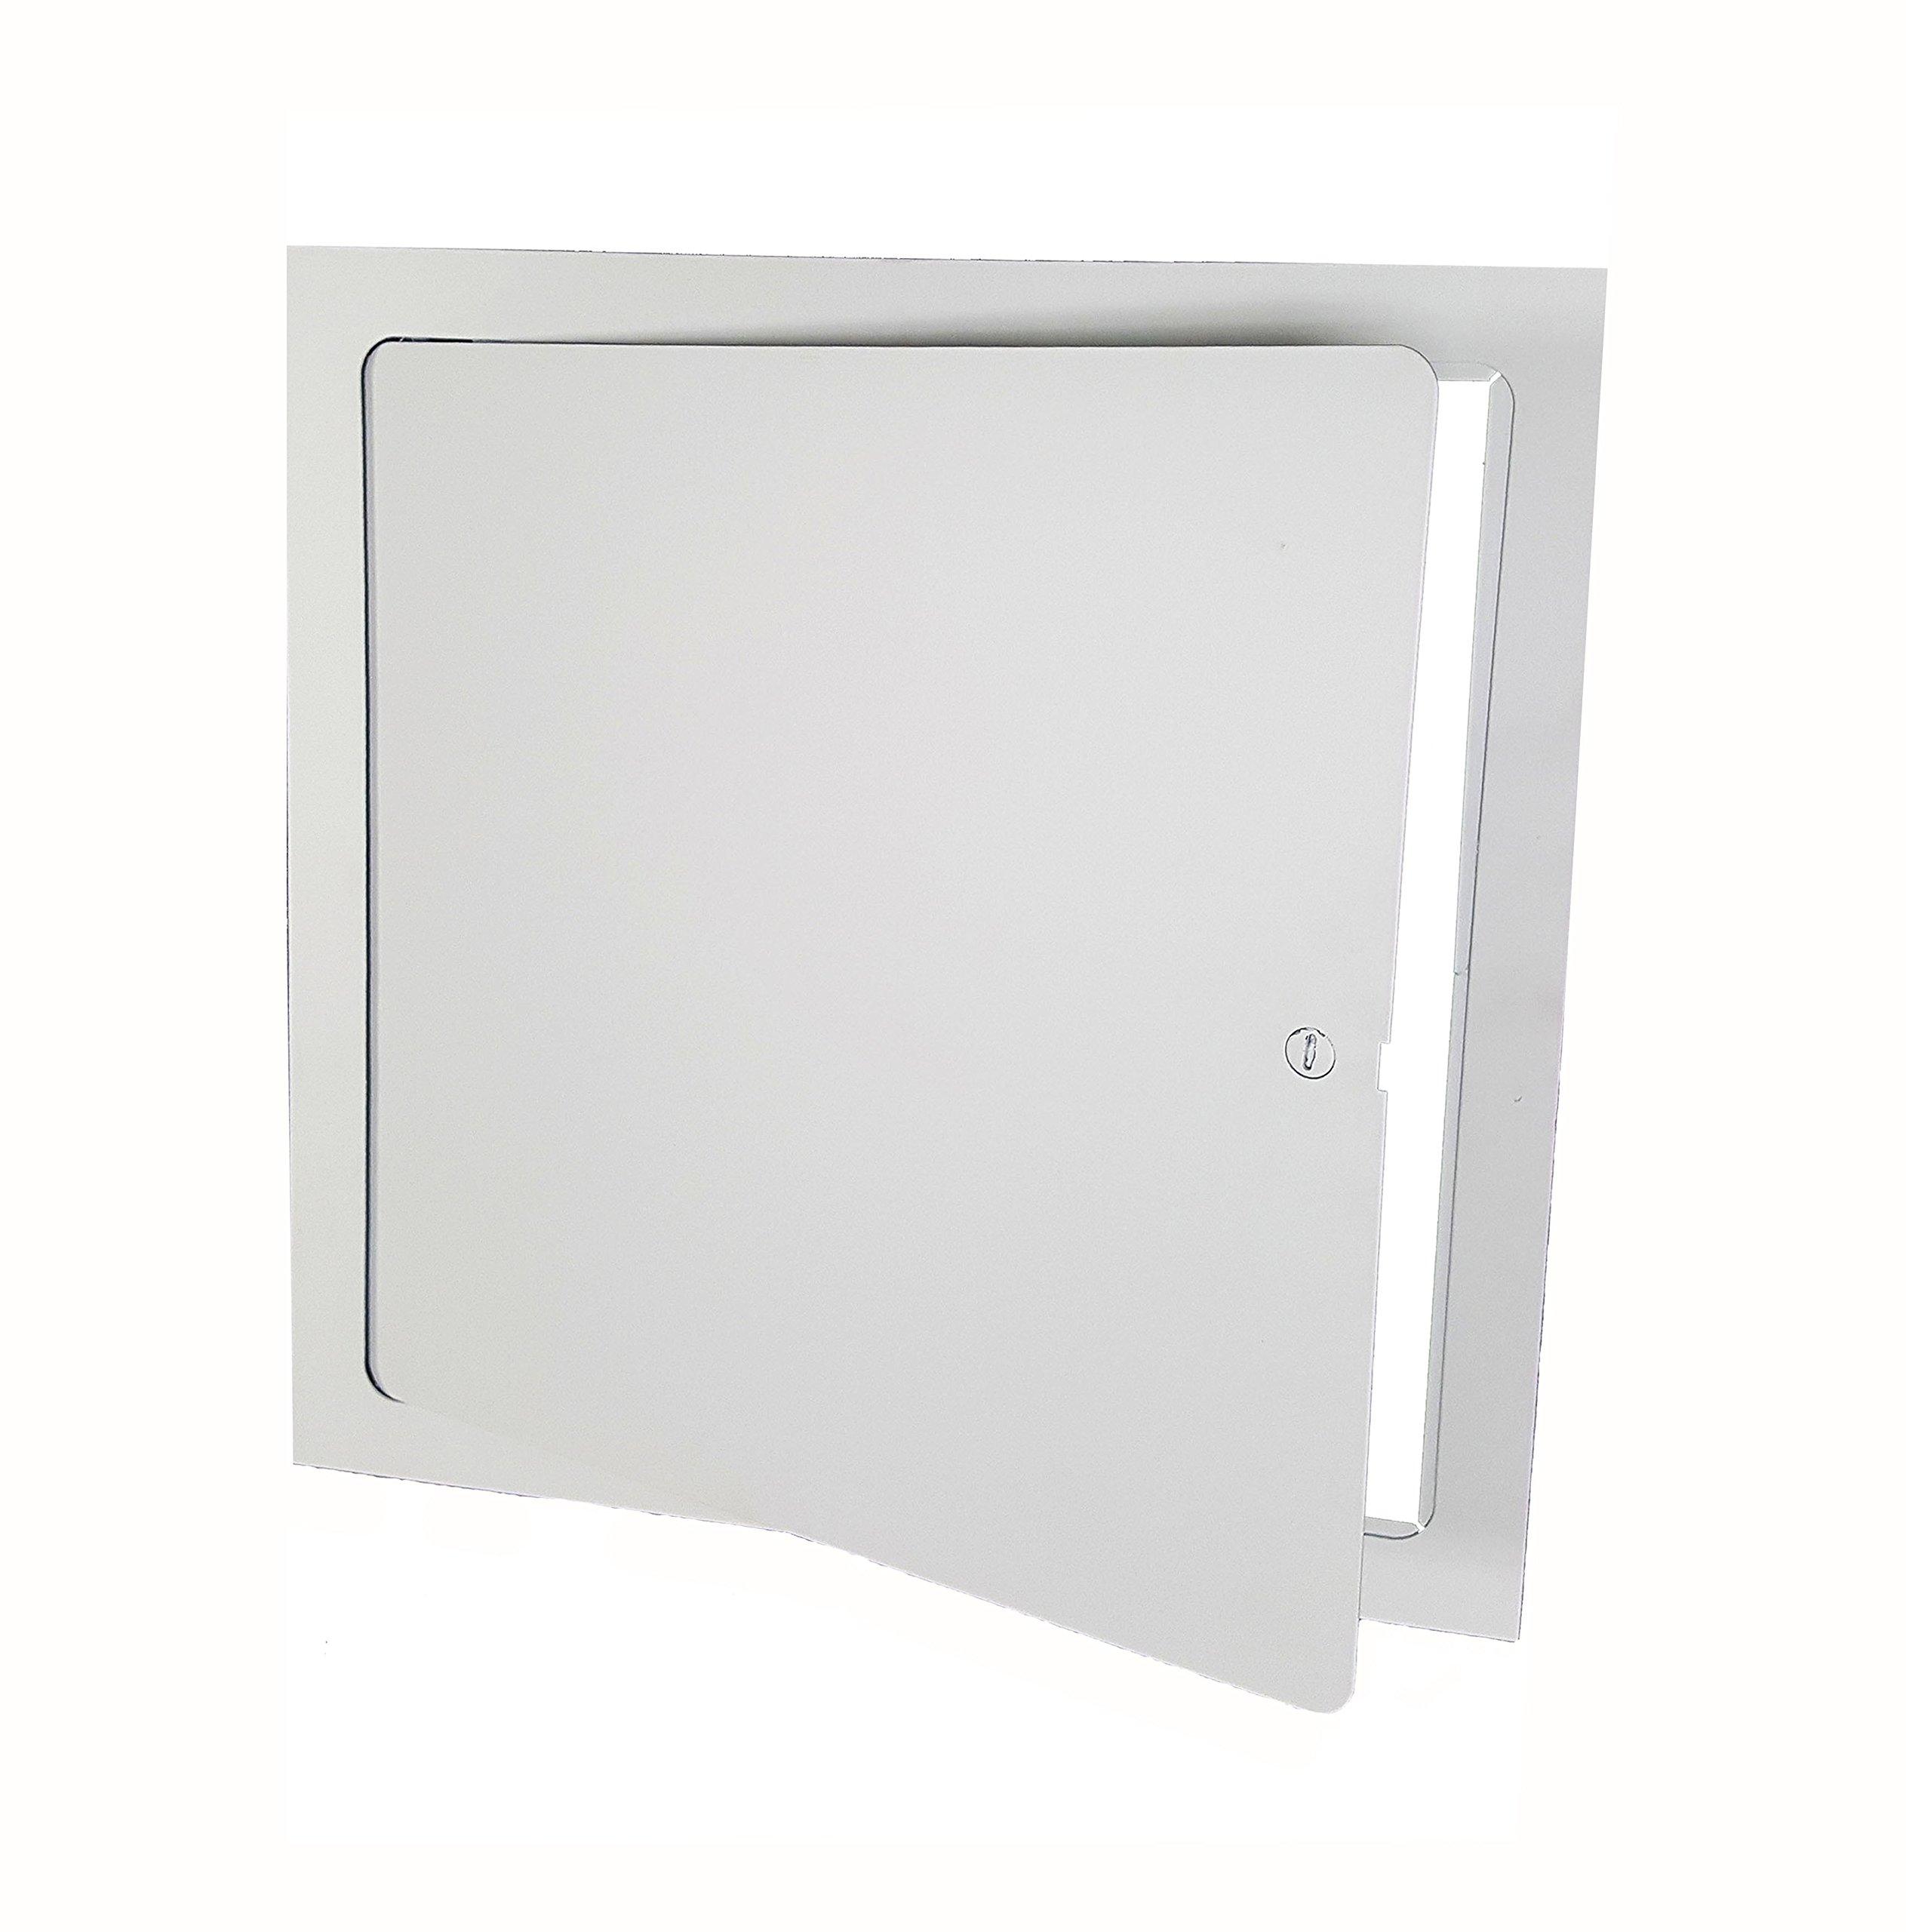 Premier FL-8 x 8 Flush Access Door, Steel, Powder Coated White